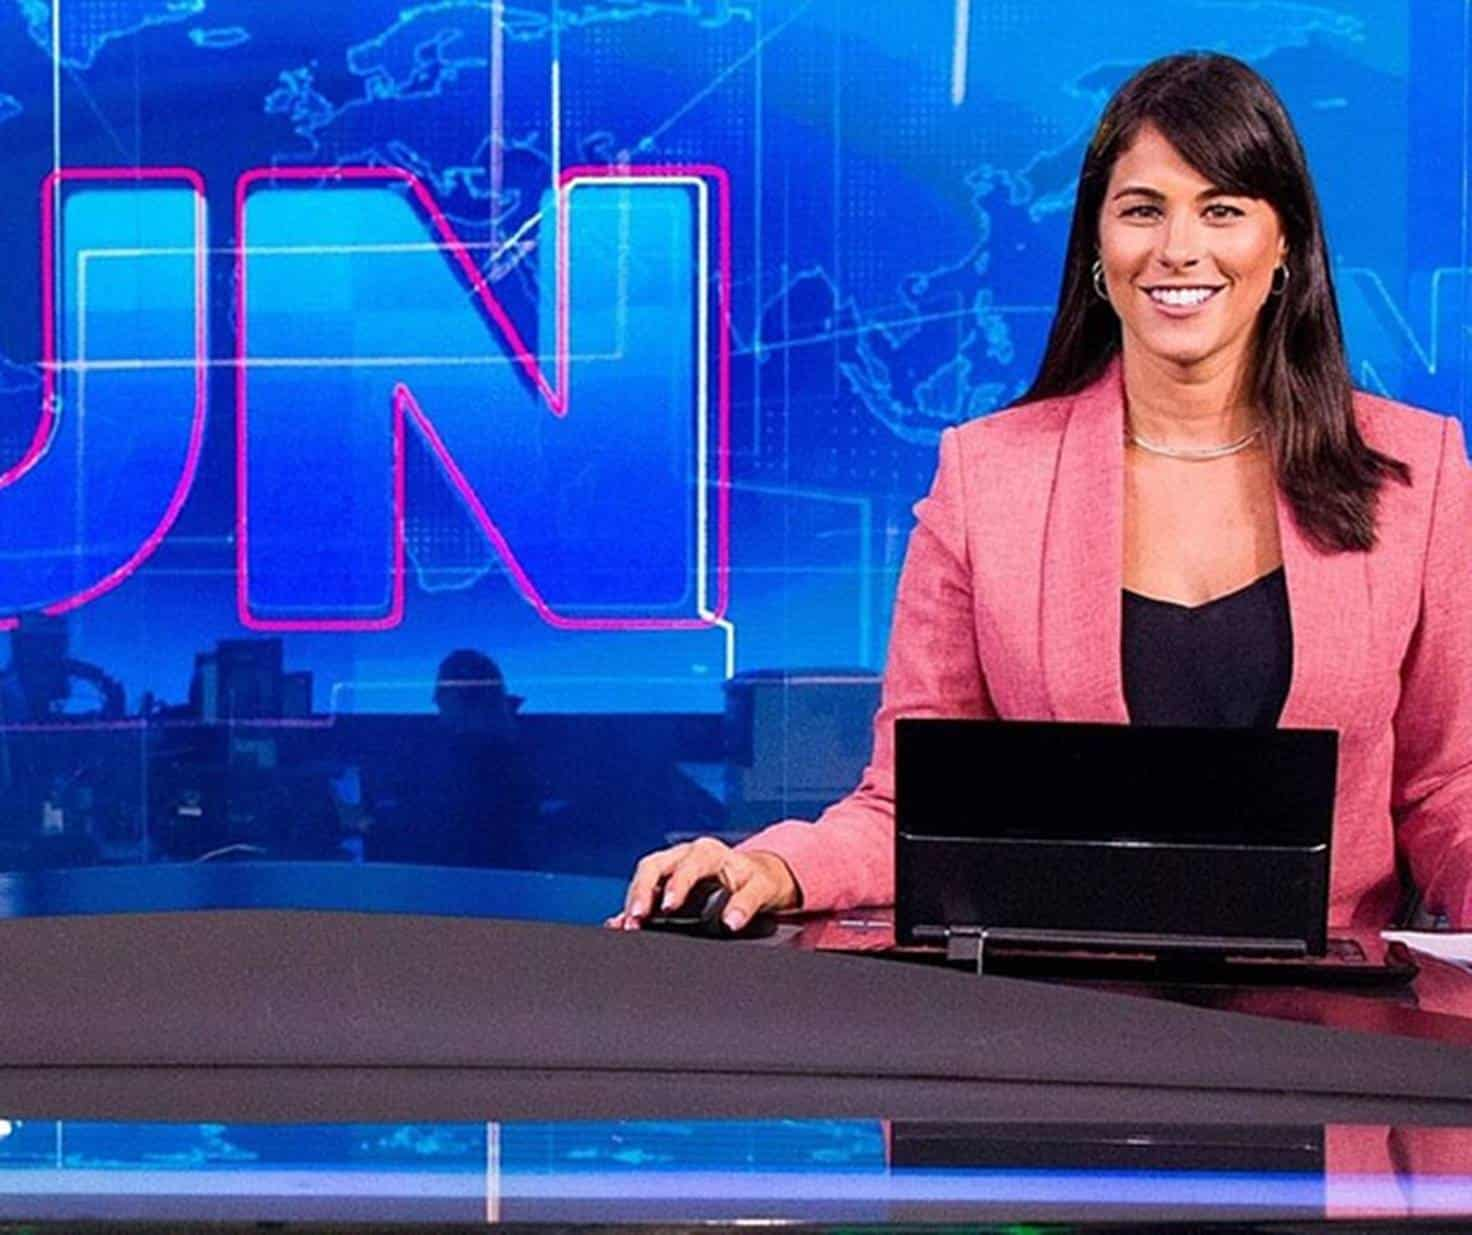 Jéssica Senra passa a apresentar 'Jornal Nacional' em 2020